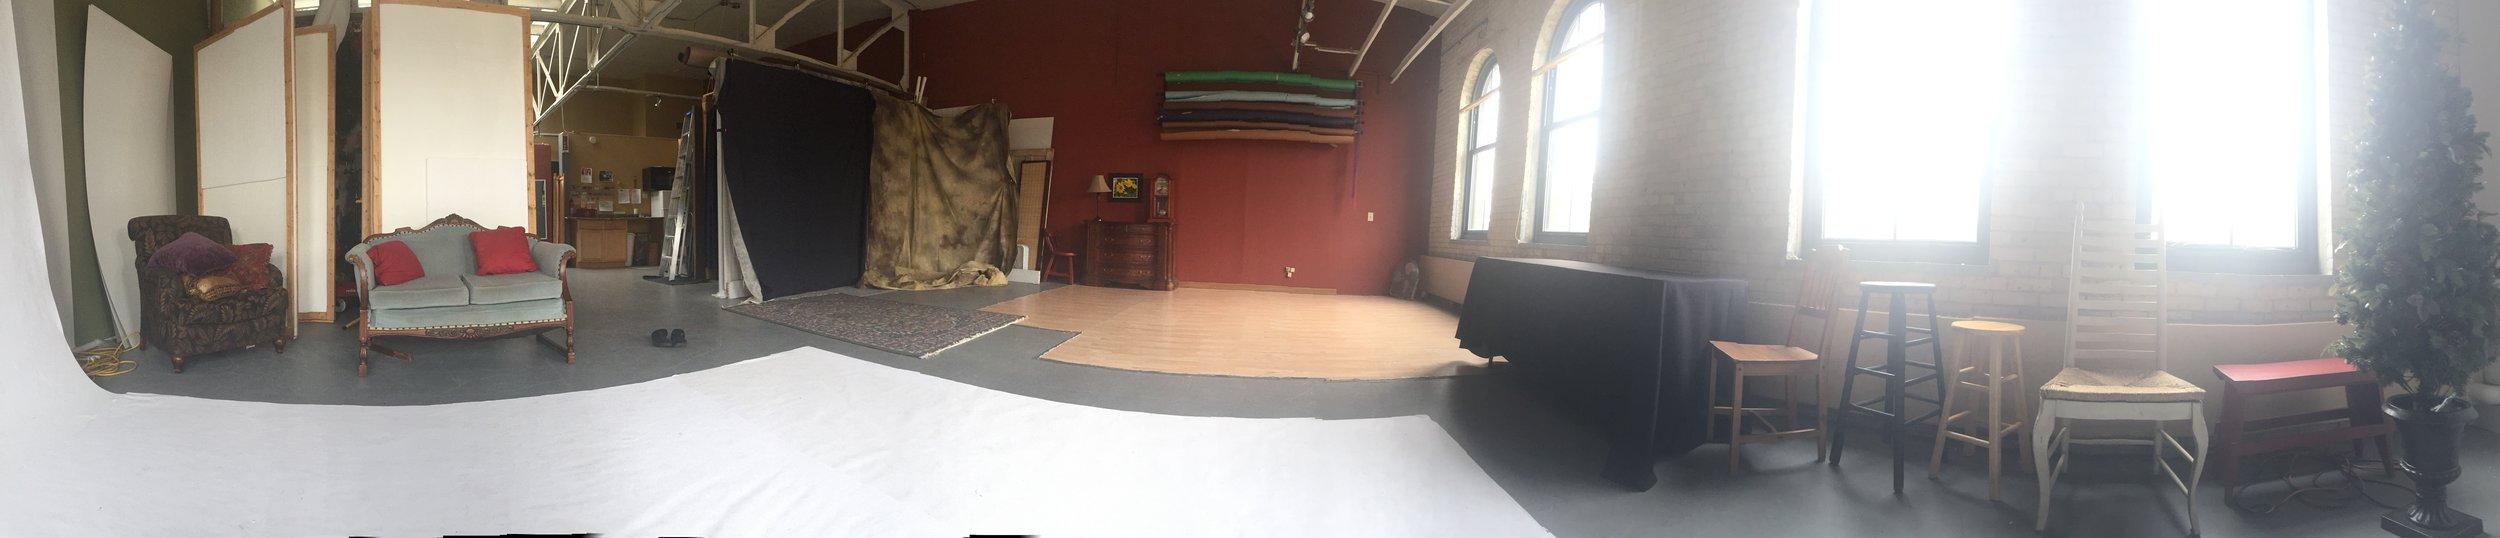 photo studio in NE minneapolis